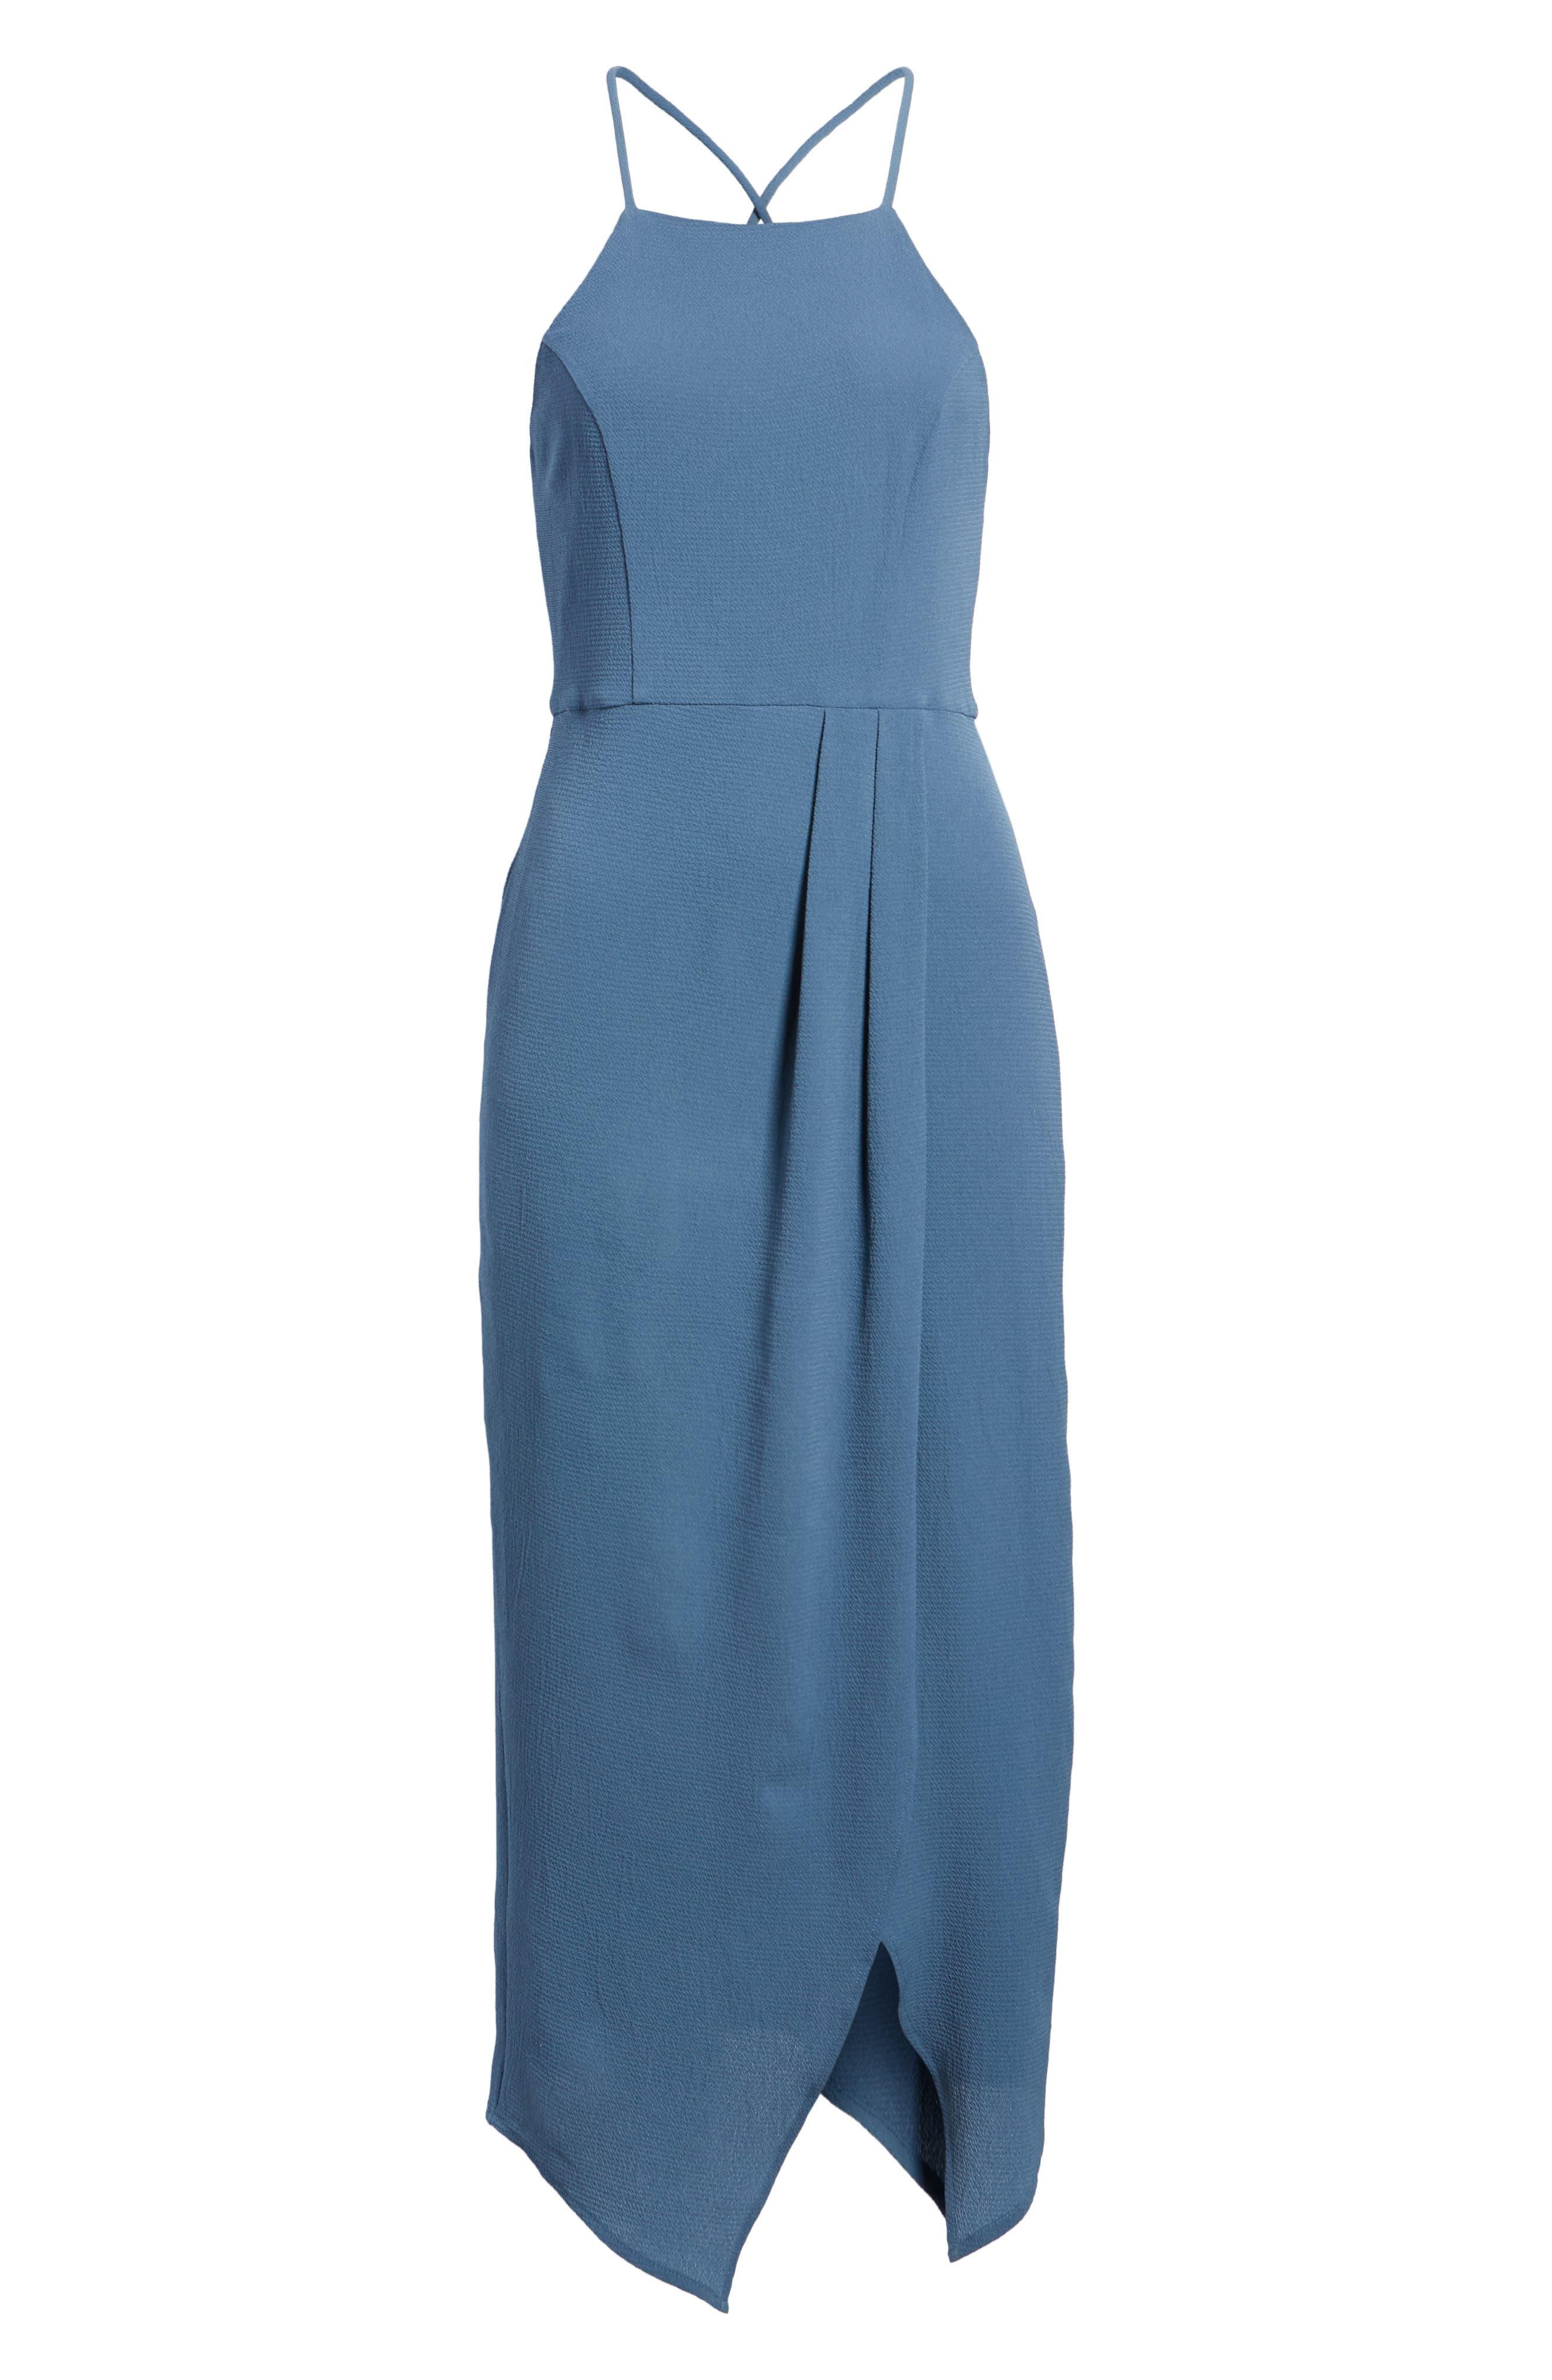 Wrap Midi Dress,                             Alternate thumbnail 6, color,                             Dusty Teal